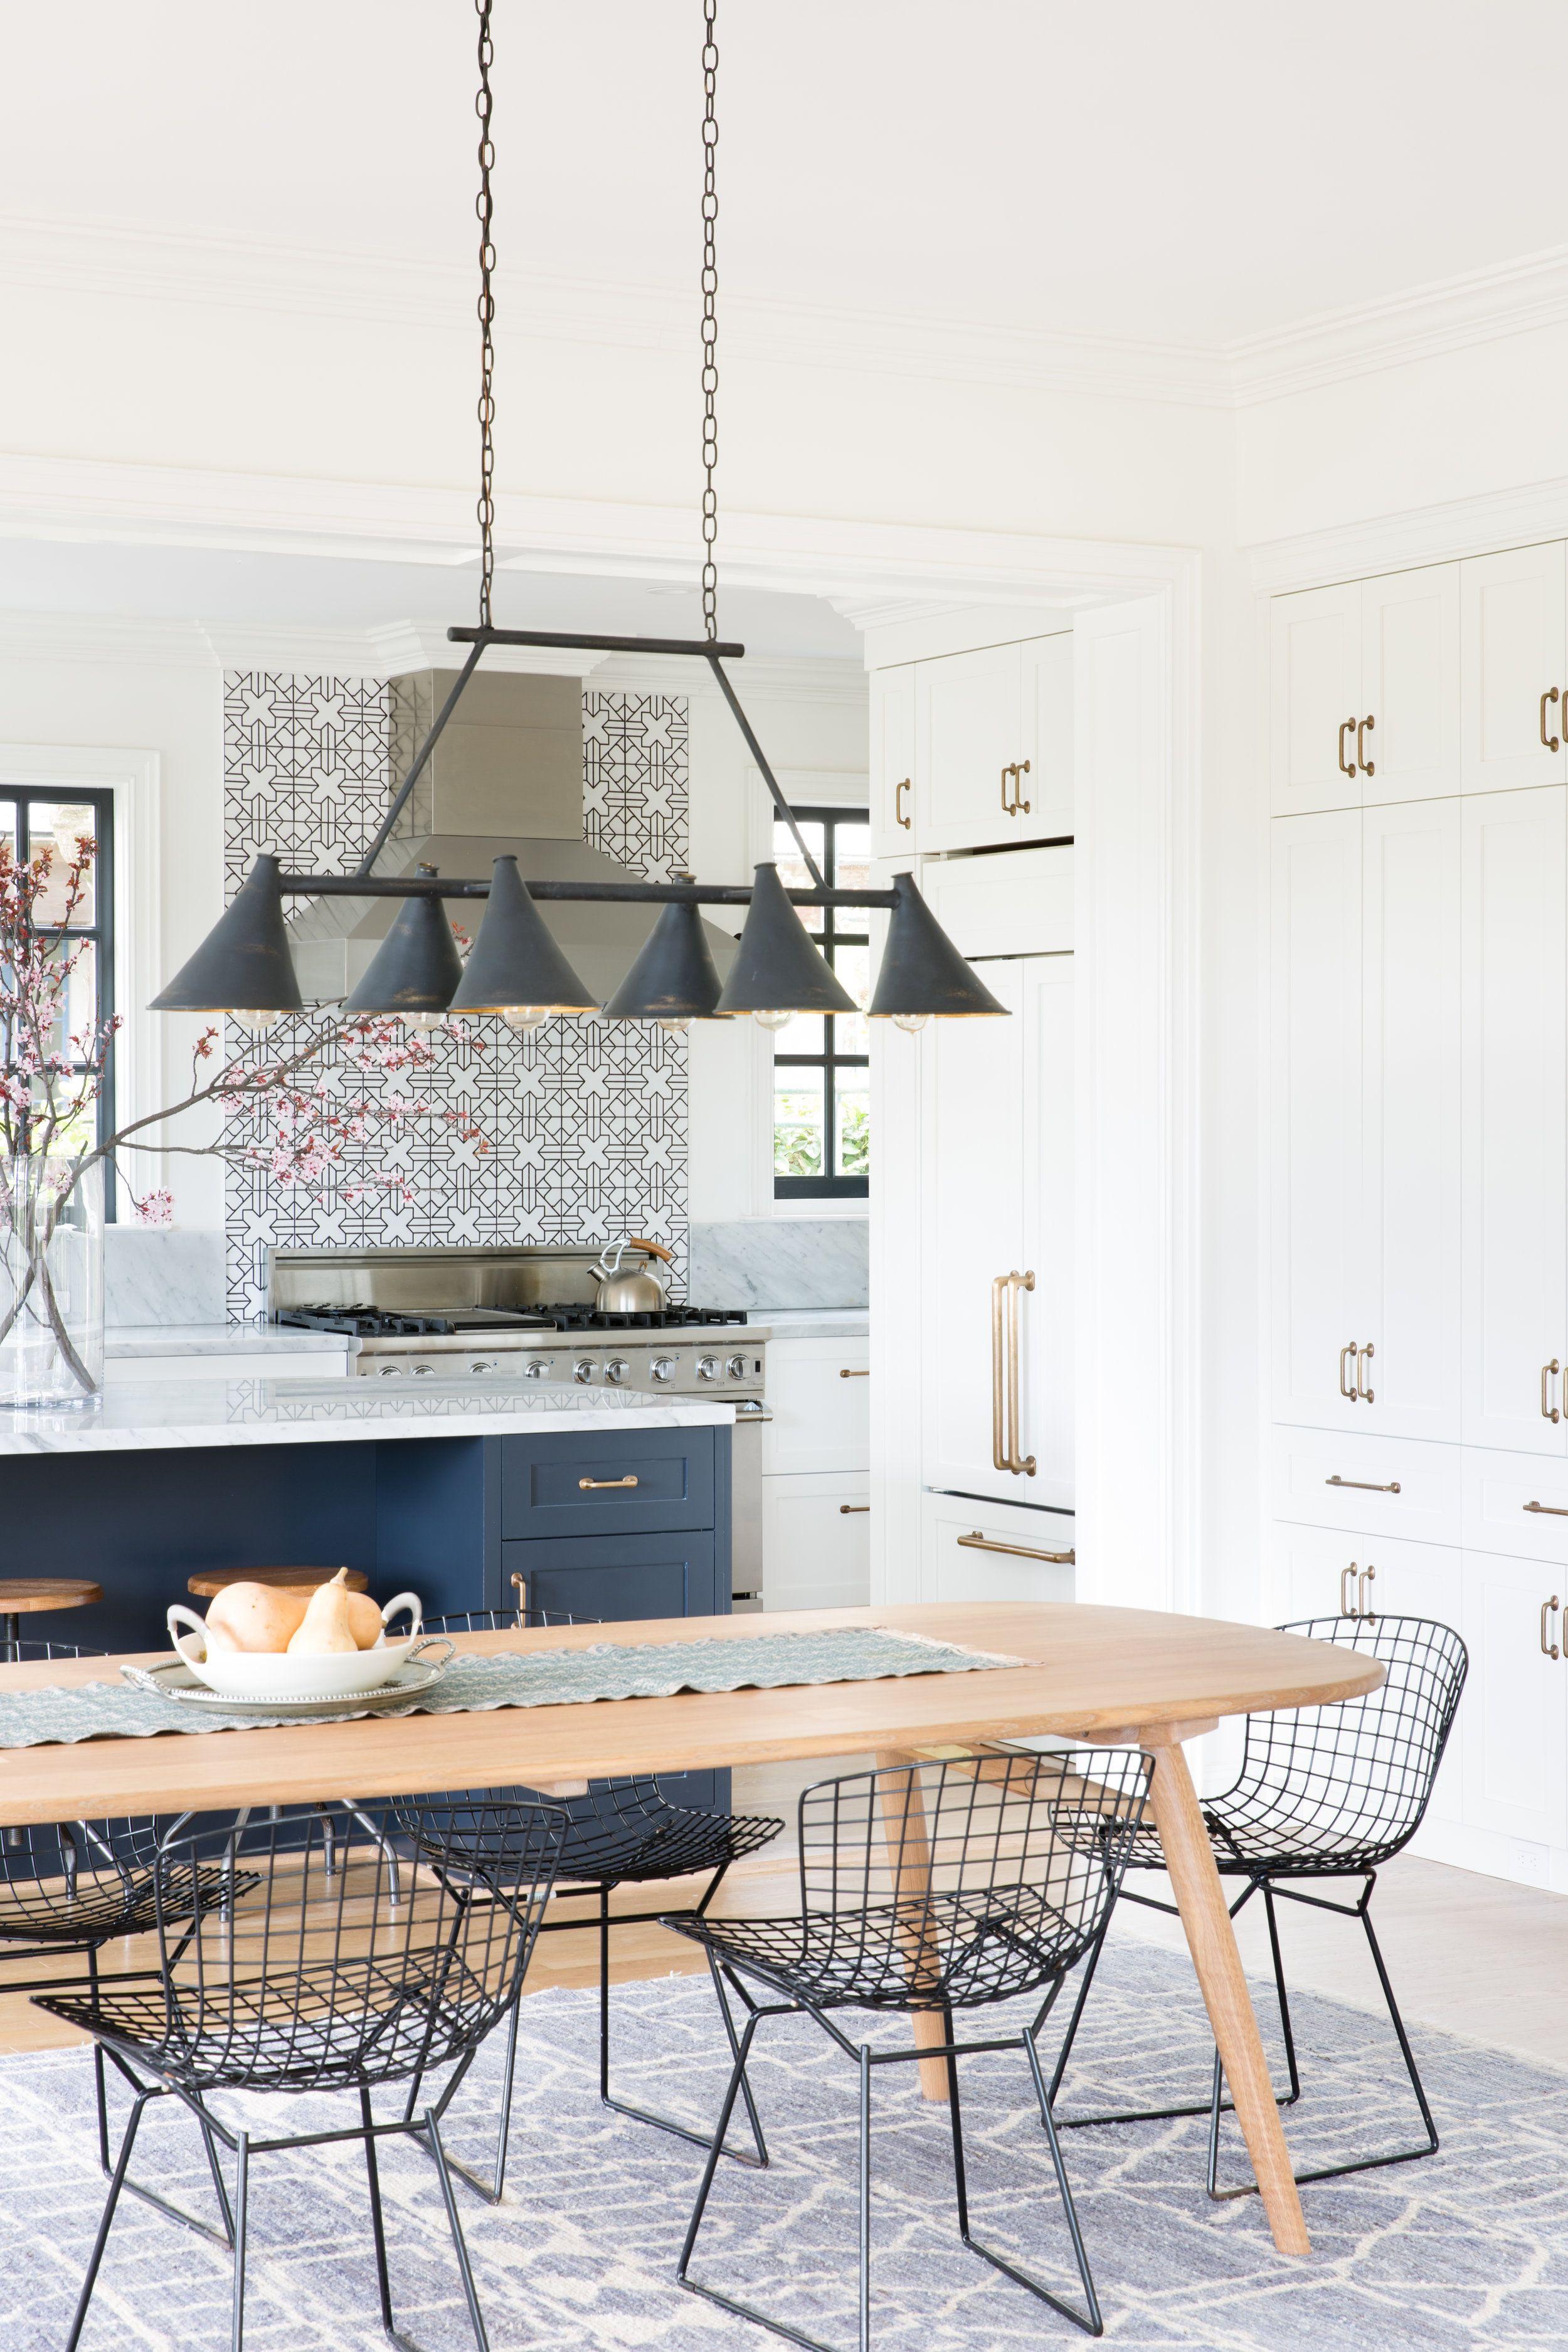 Modern Dining Chairs  A Boho Rug  Regan Baker Design  Dining Stunning Islands Dining Room 2018